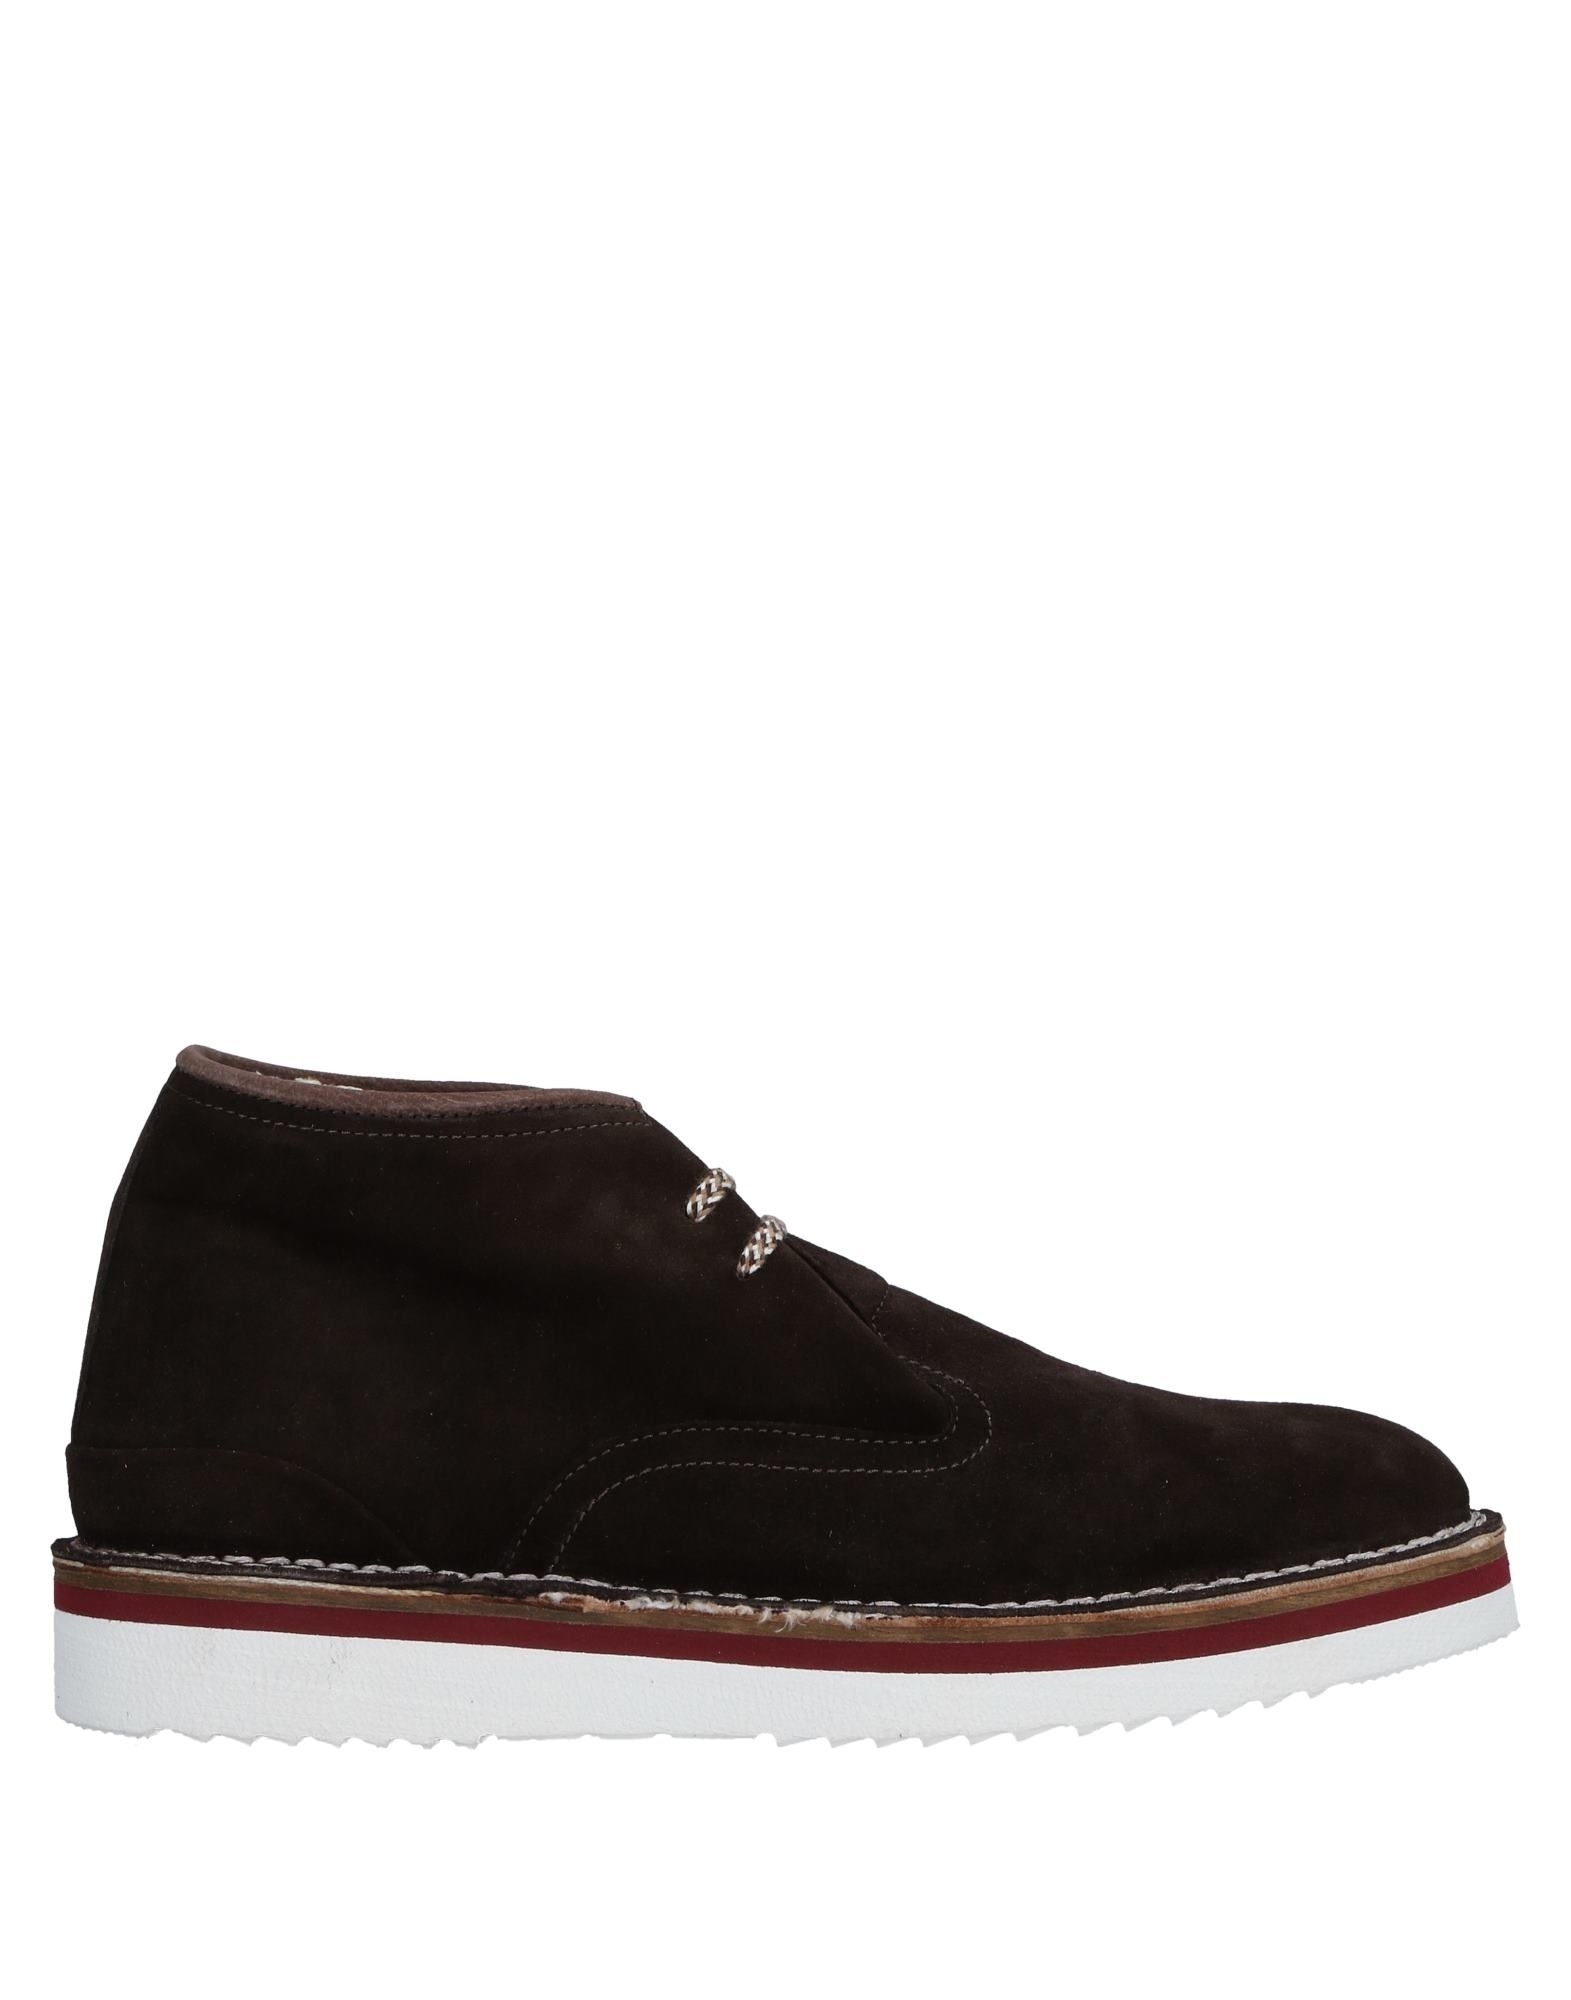 LAGOA Boots in Dark Brown